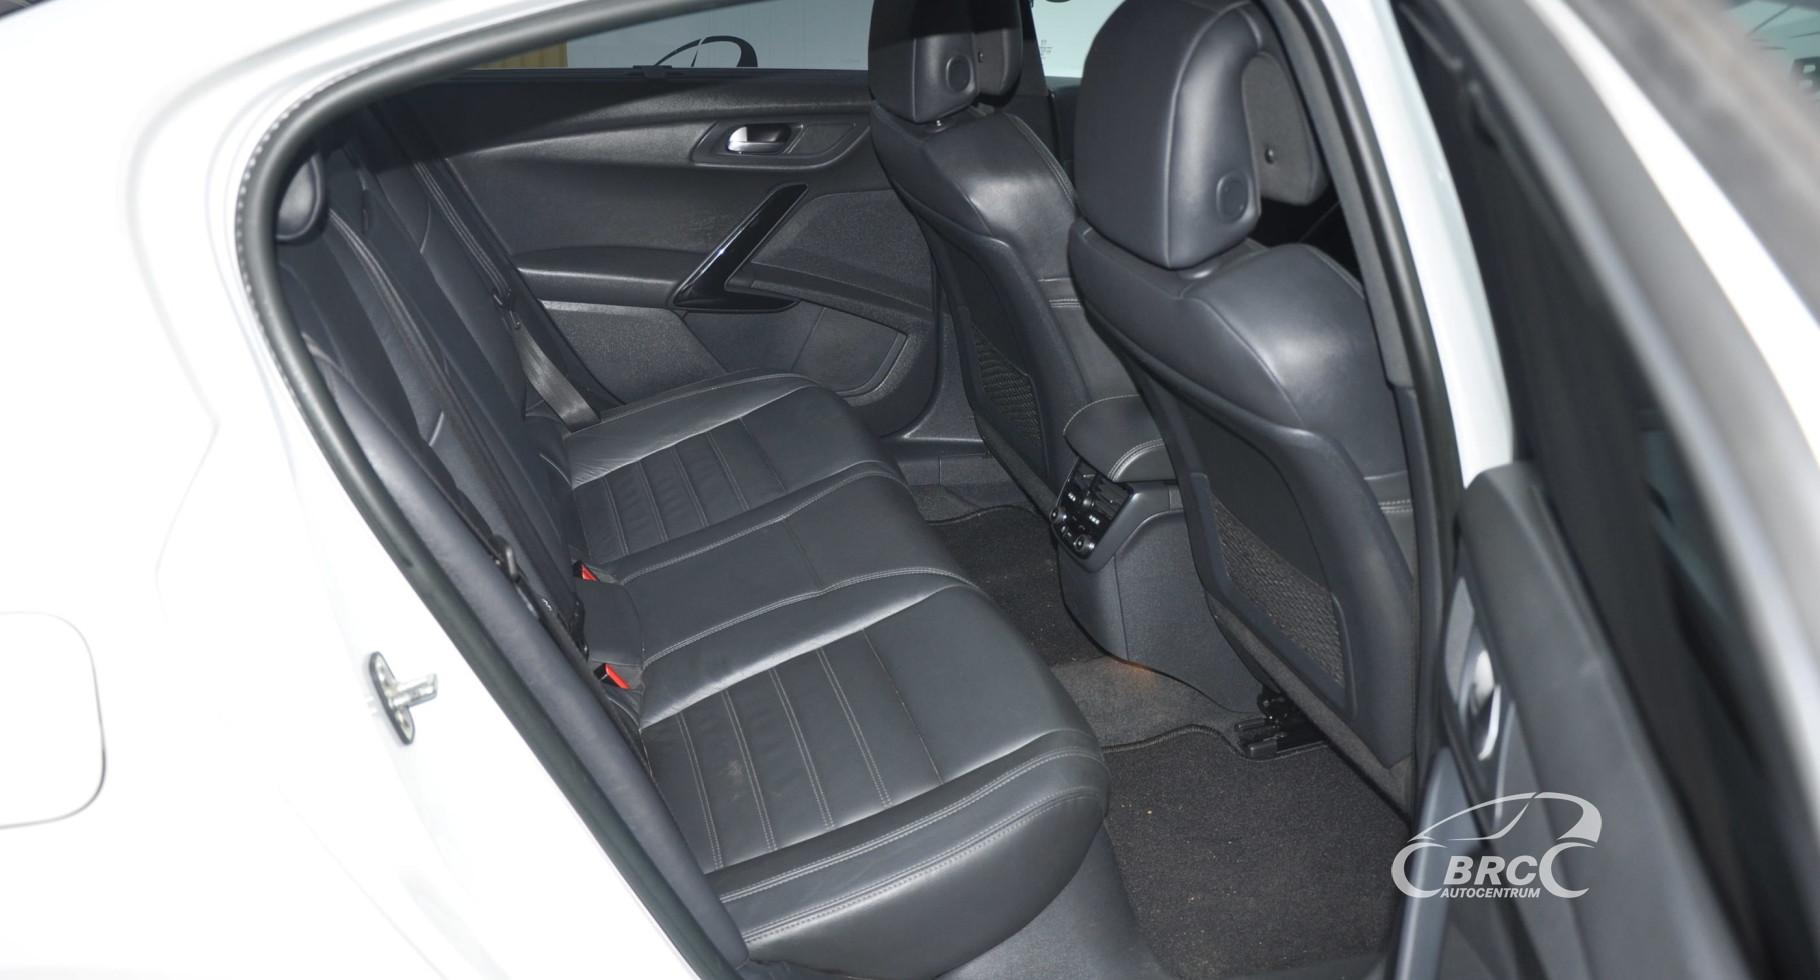 Peugeot 508 2.0 HDi Hybrid Automatas